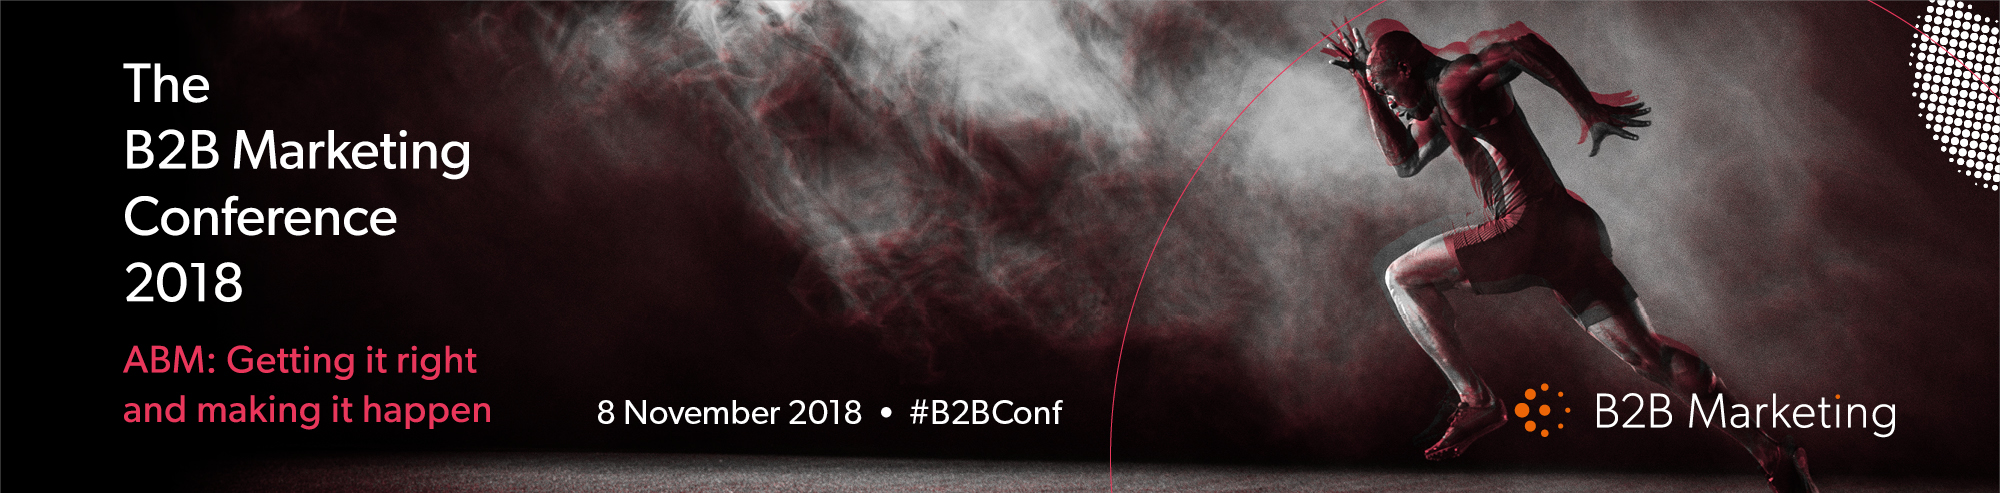 B2B Marketing Conference  2018